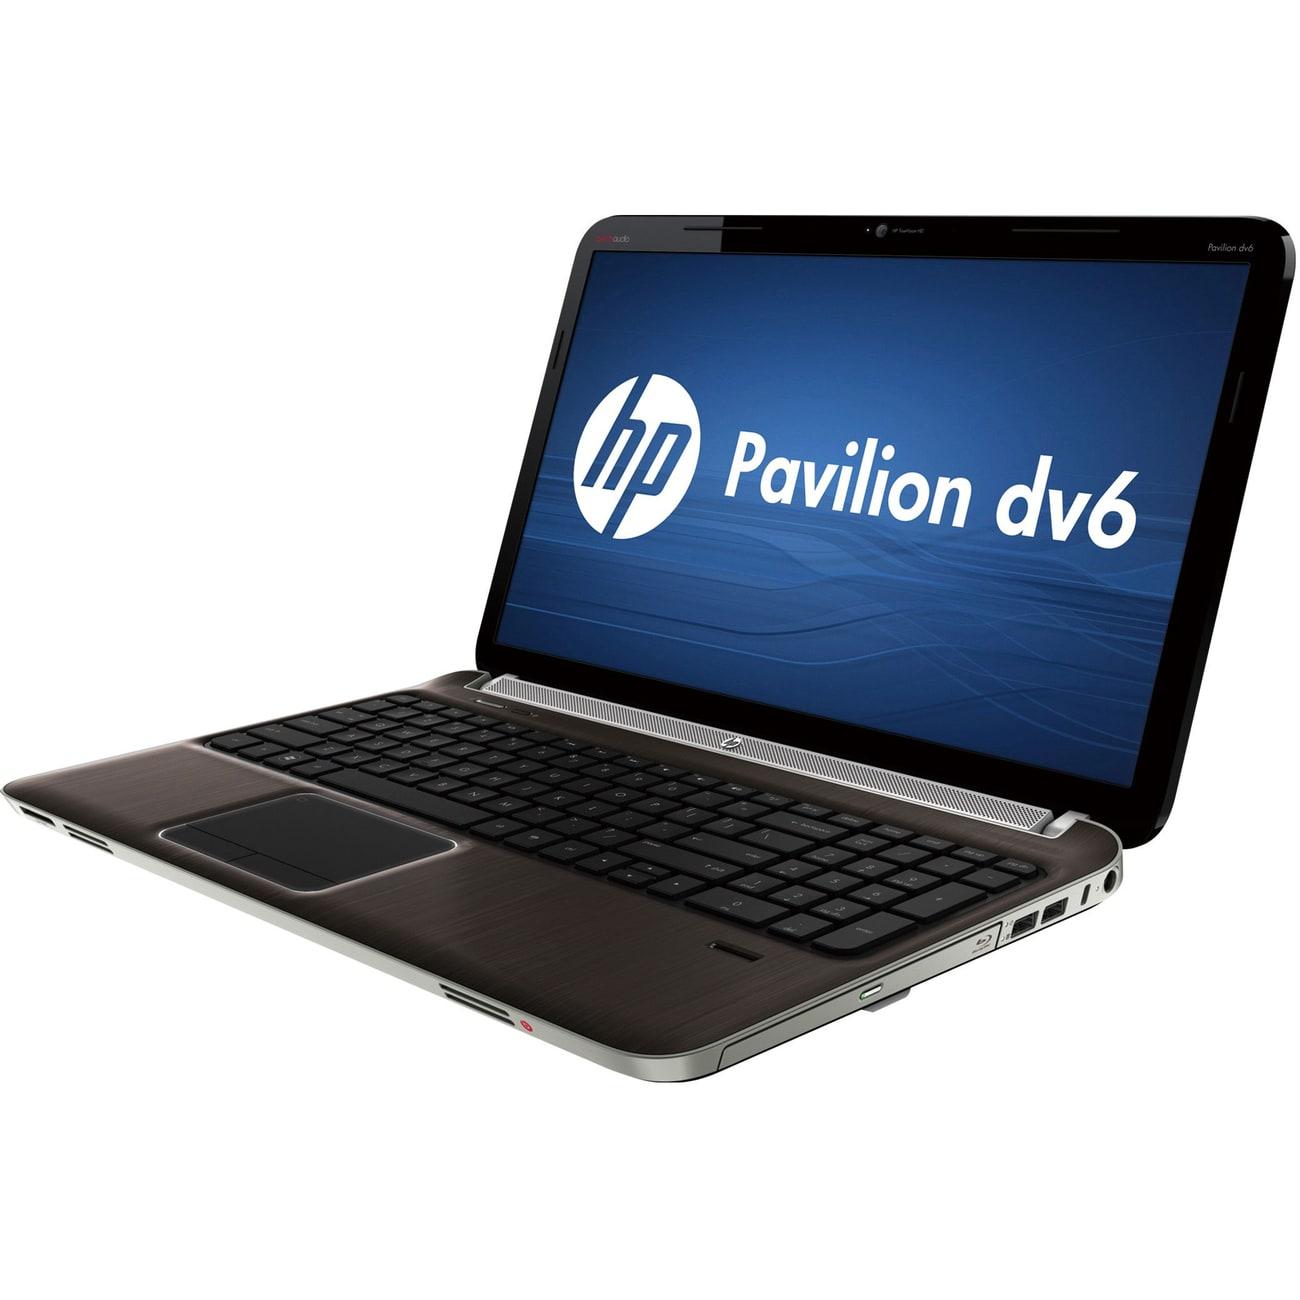 "HP Pavilion dv6-6c00 dv6-6c35dx A6Y53UA 15.6"" LED Notebook A8-3520M 1"